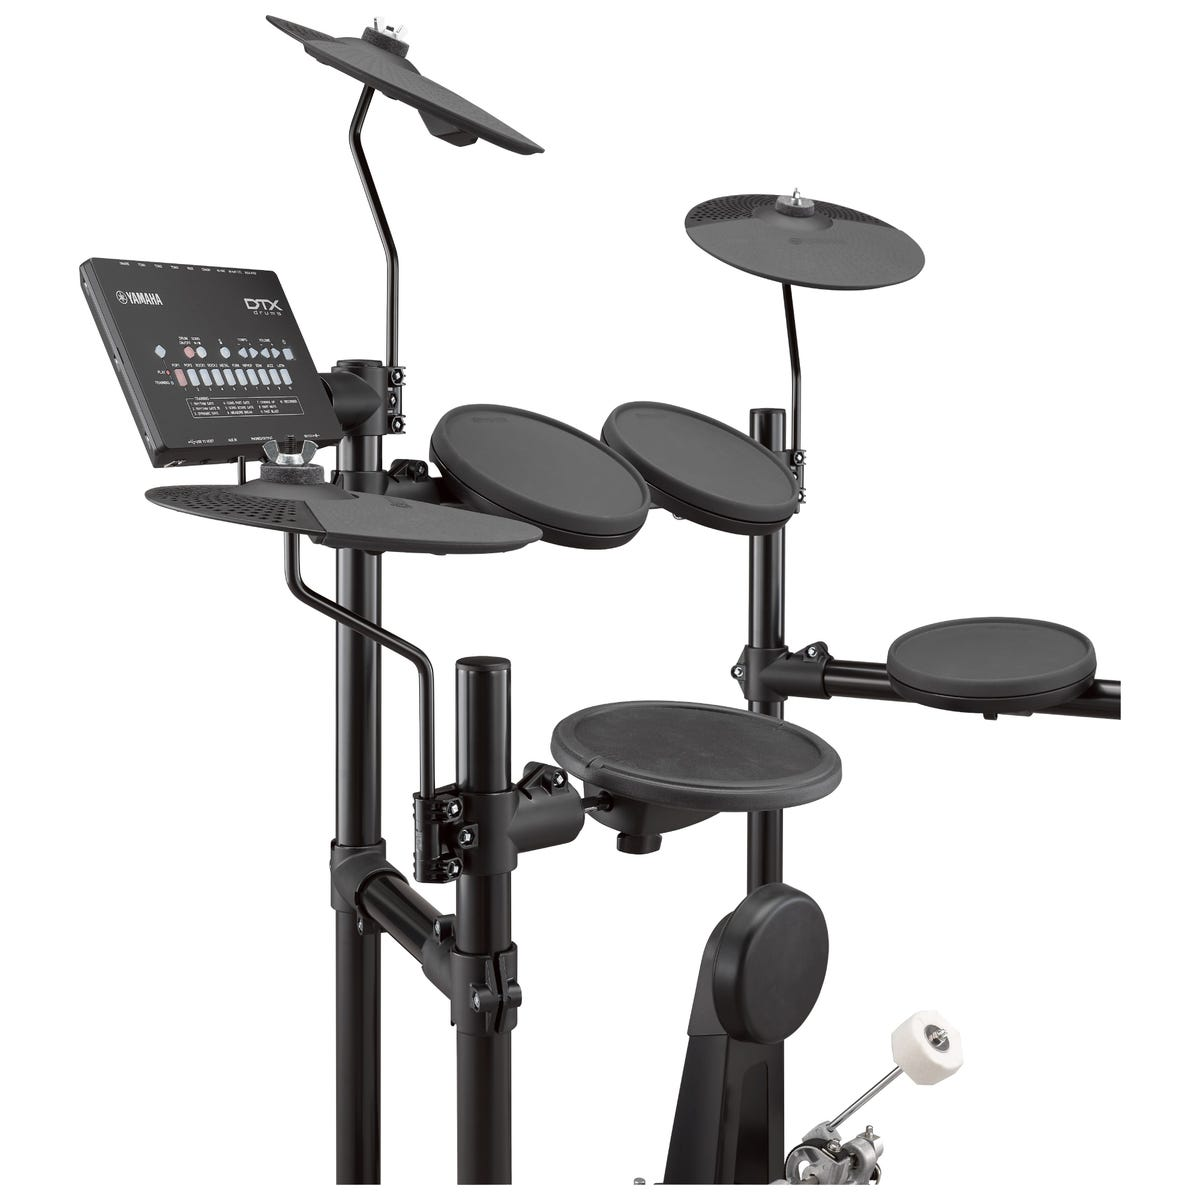 Yamaha DTX452K Electronic Drum Kit w/Sticks + Stool + Headphones!